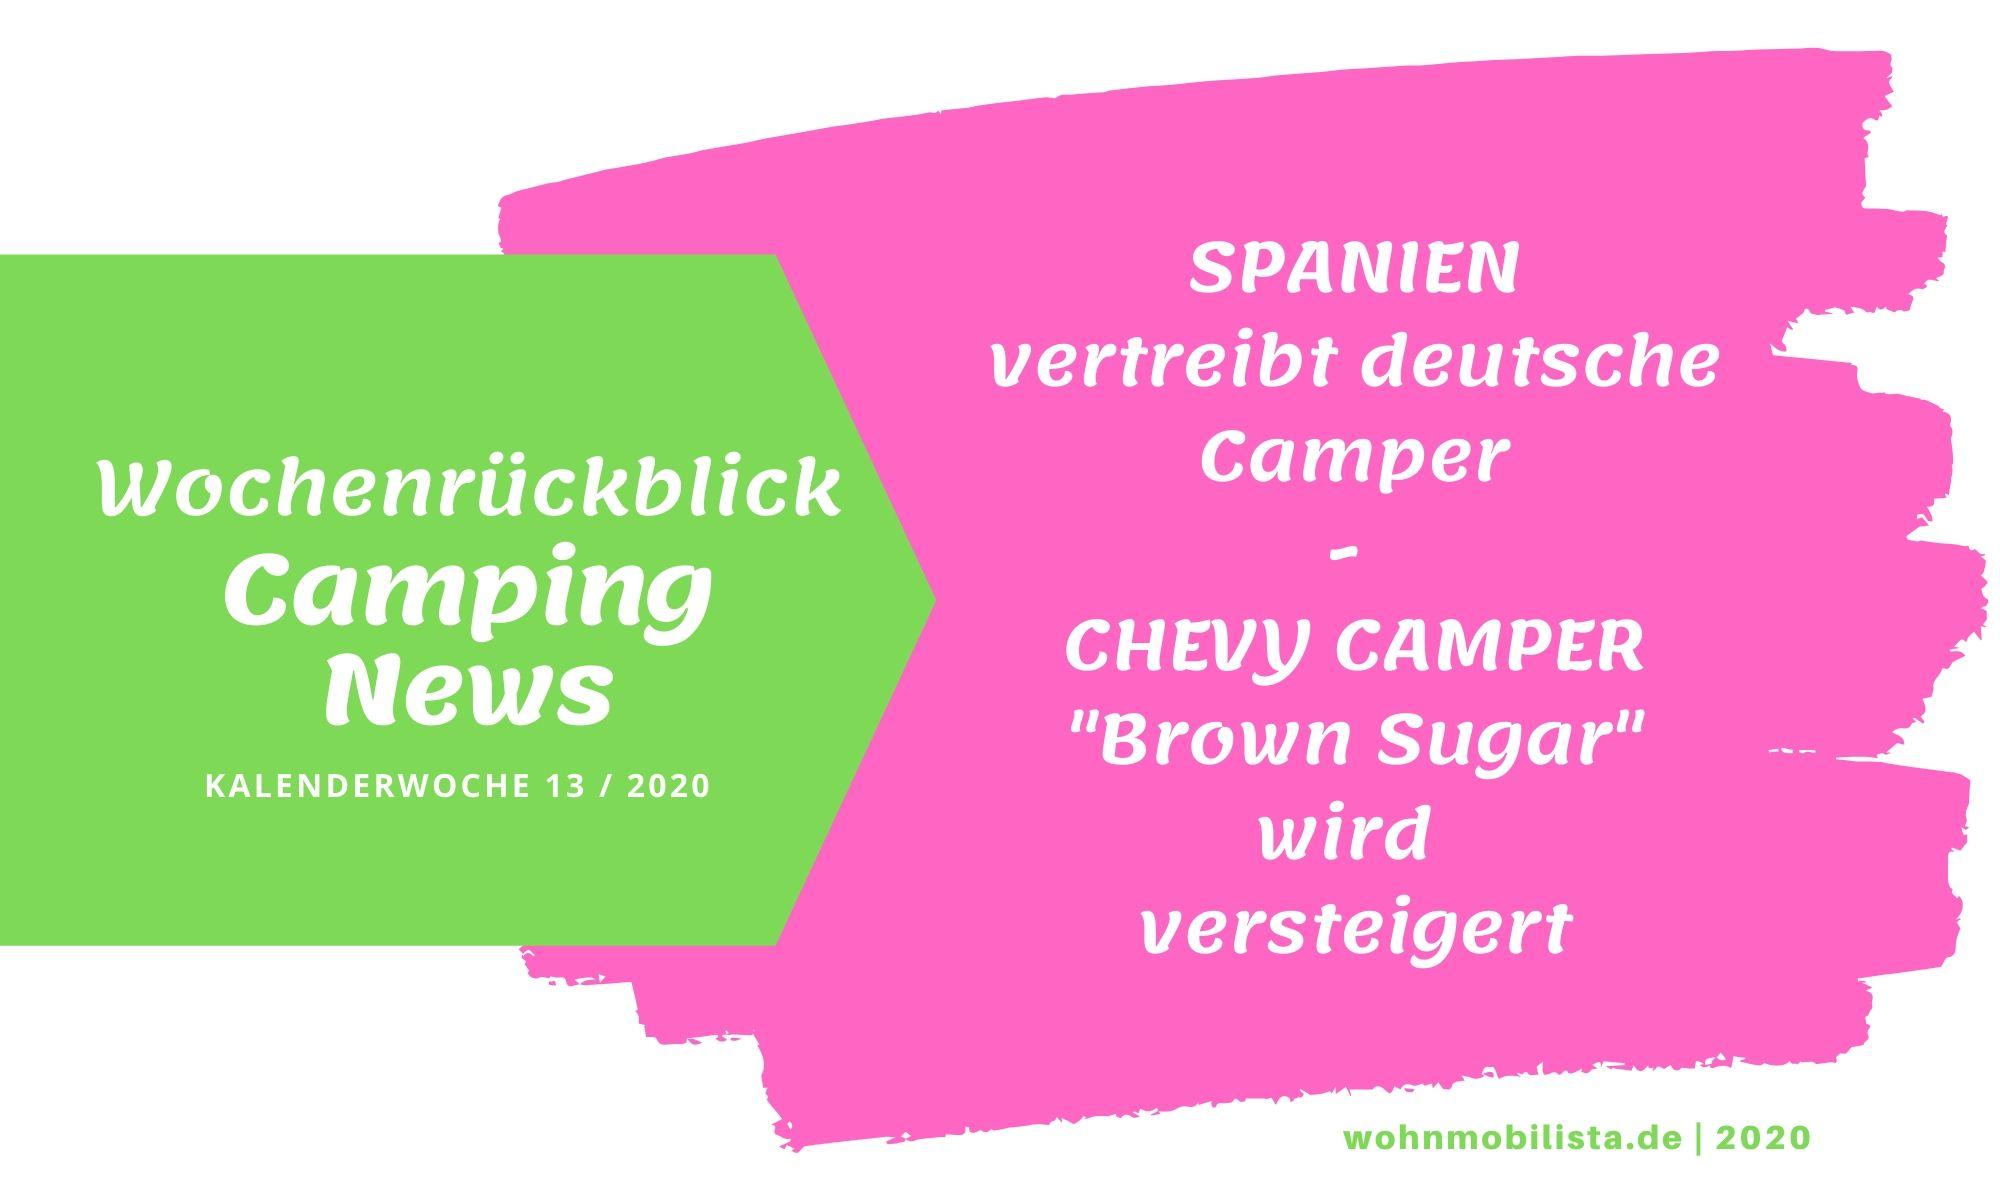 Wochenrückblick Camping News KW13-2020